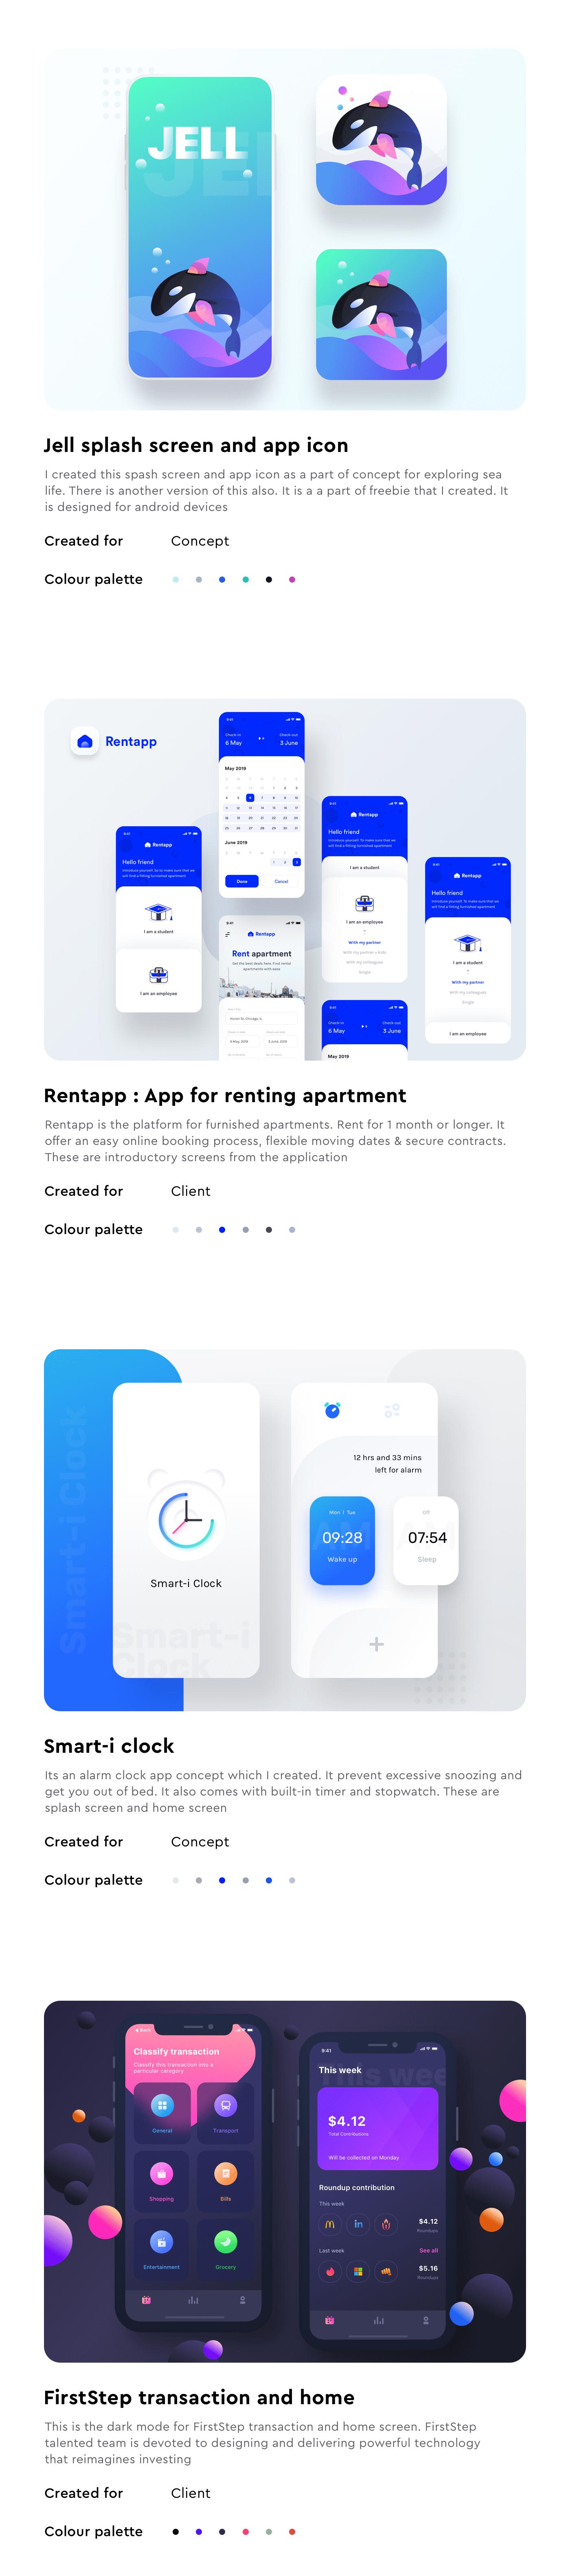 2019 trending UI UX design modern clean minimal Dark Light Day Night Mode Mobile Application design ios apple android google software prakhar neel sharma